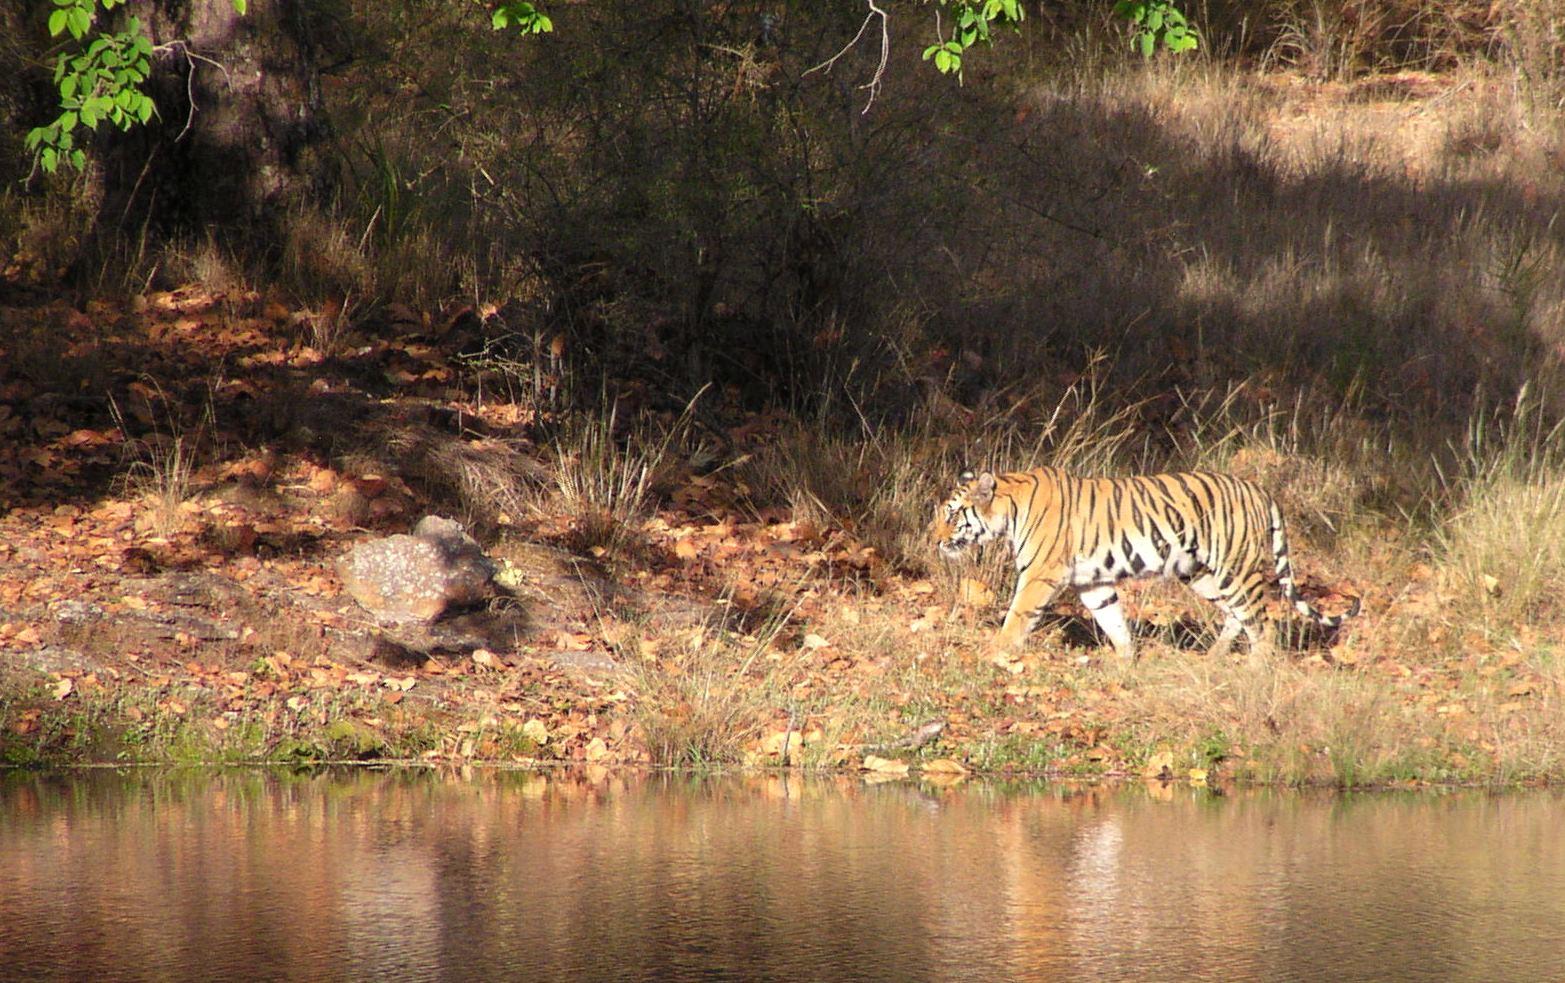 Tiger patrols a river bank in Bandhavgarh National Park, India.